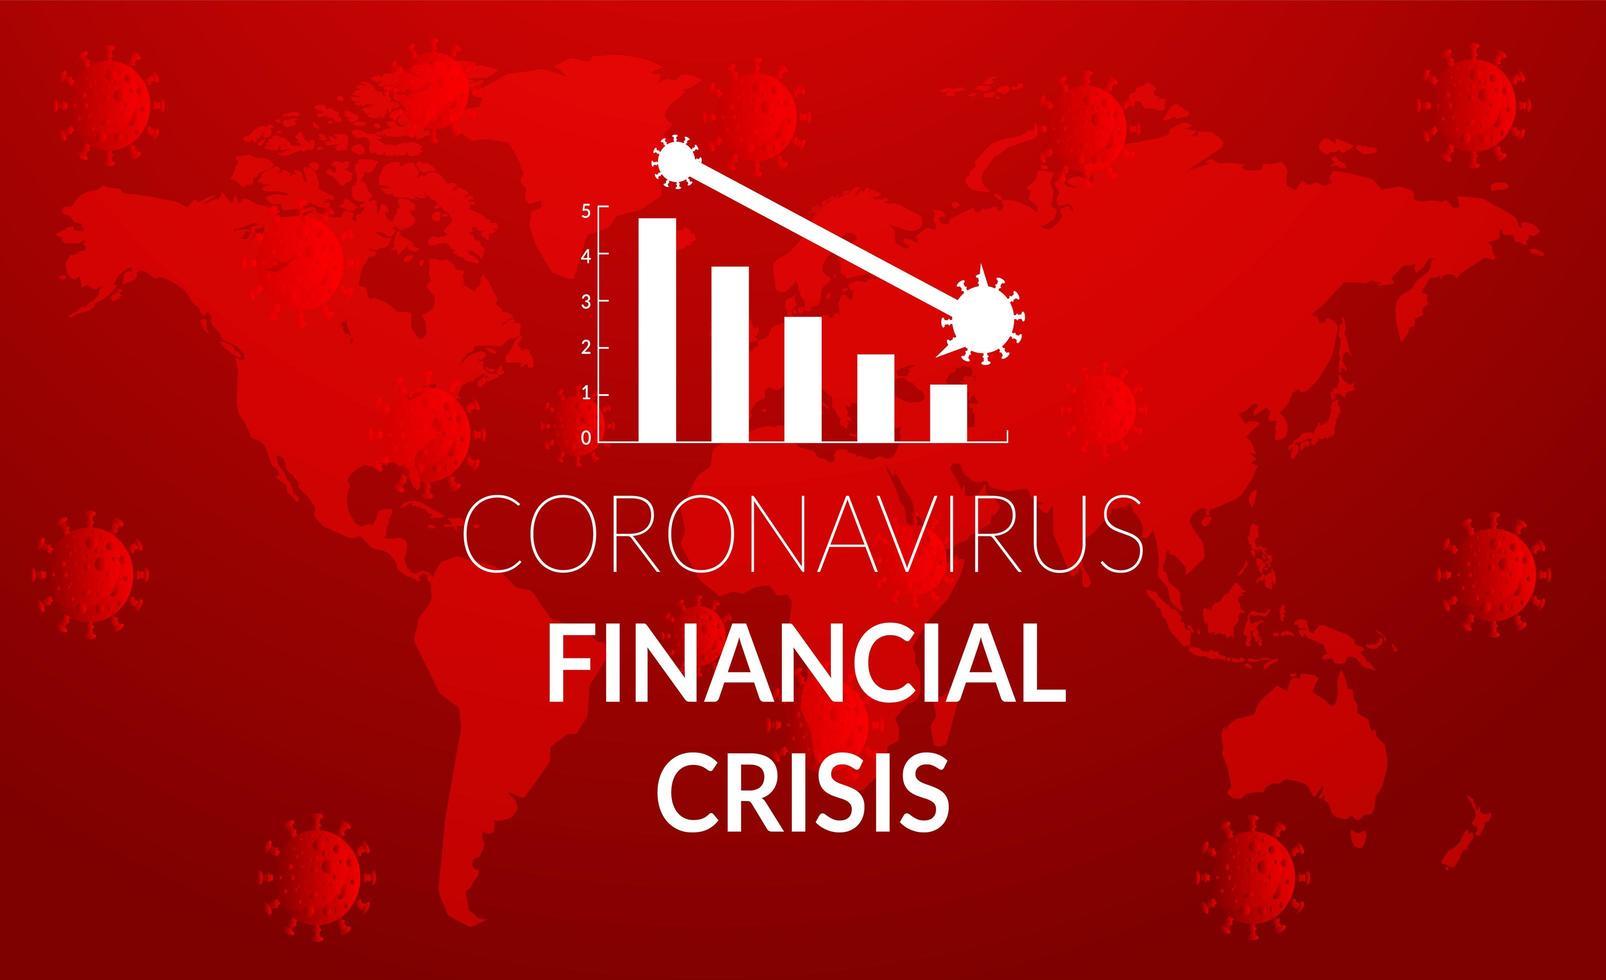 grafico di crisi caduta rossa coronavirus rosso vettore